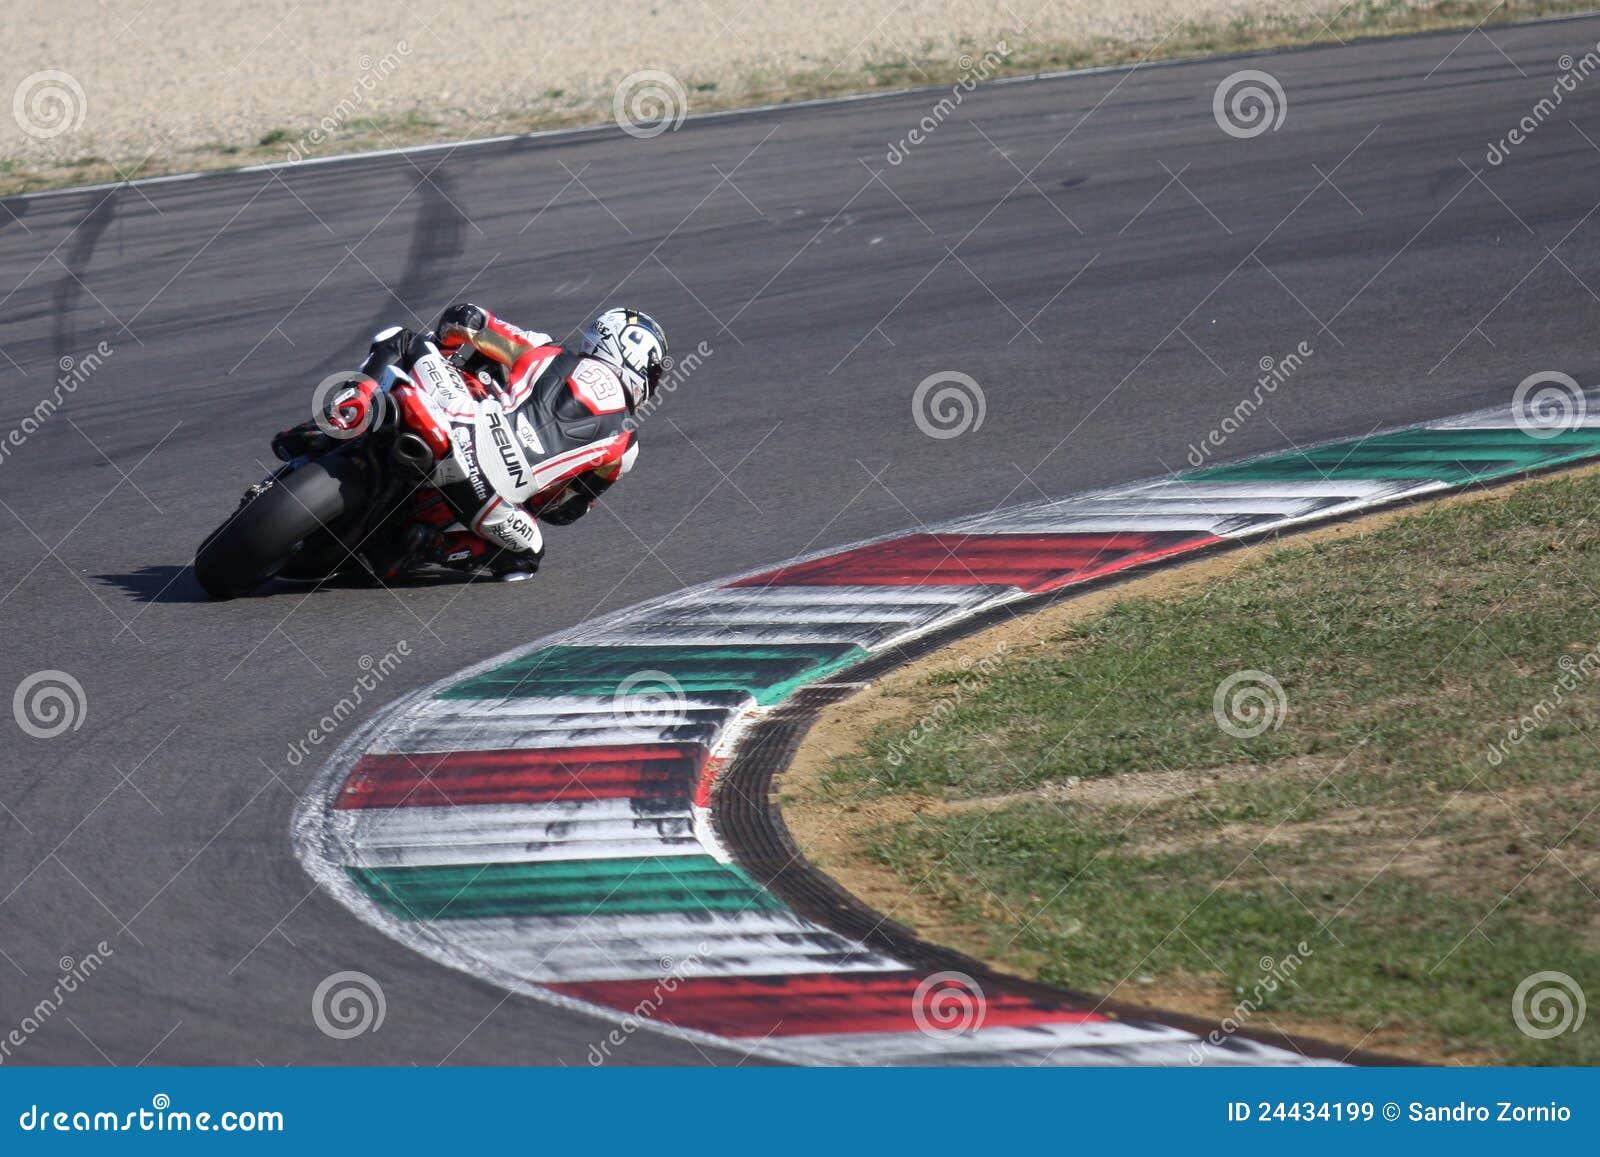 Alex Polita - Ducati 1198R - Barni Racing